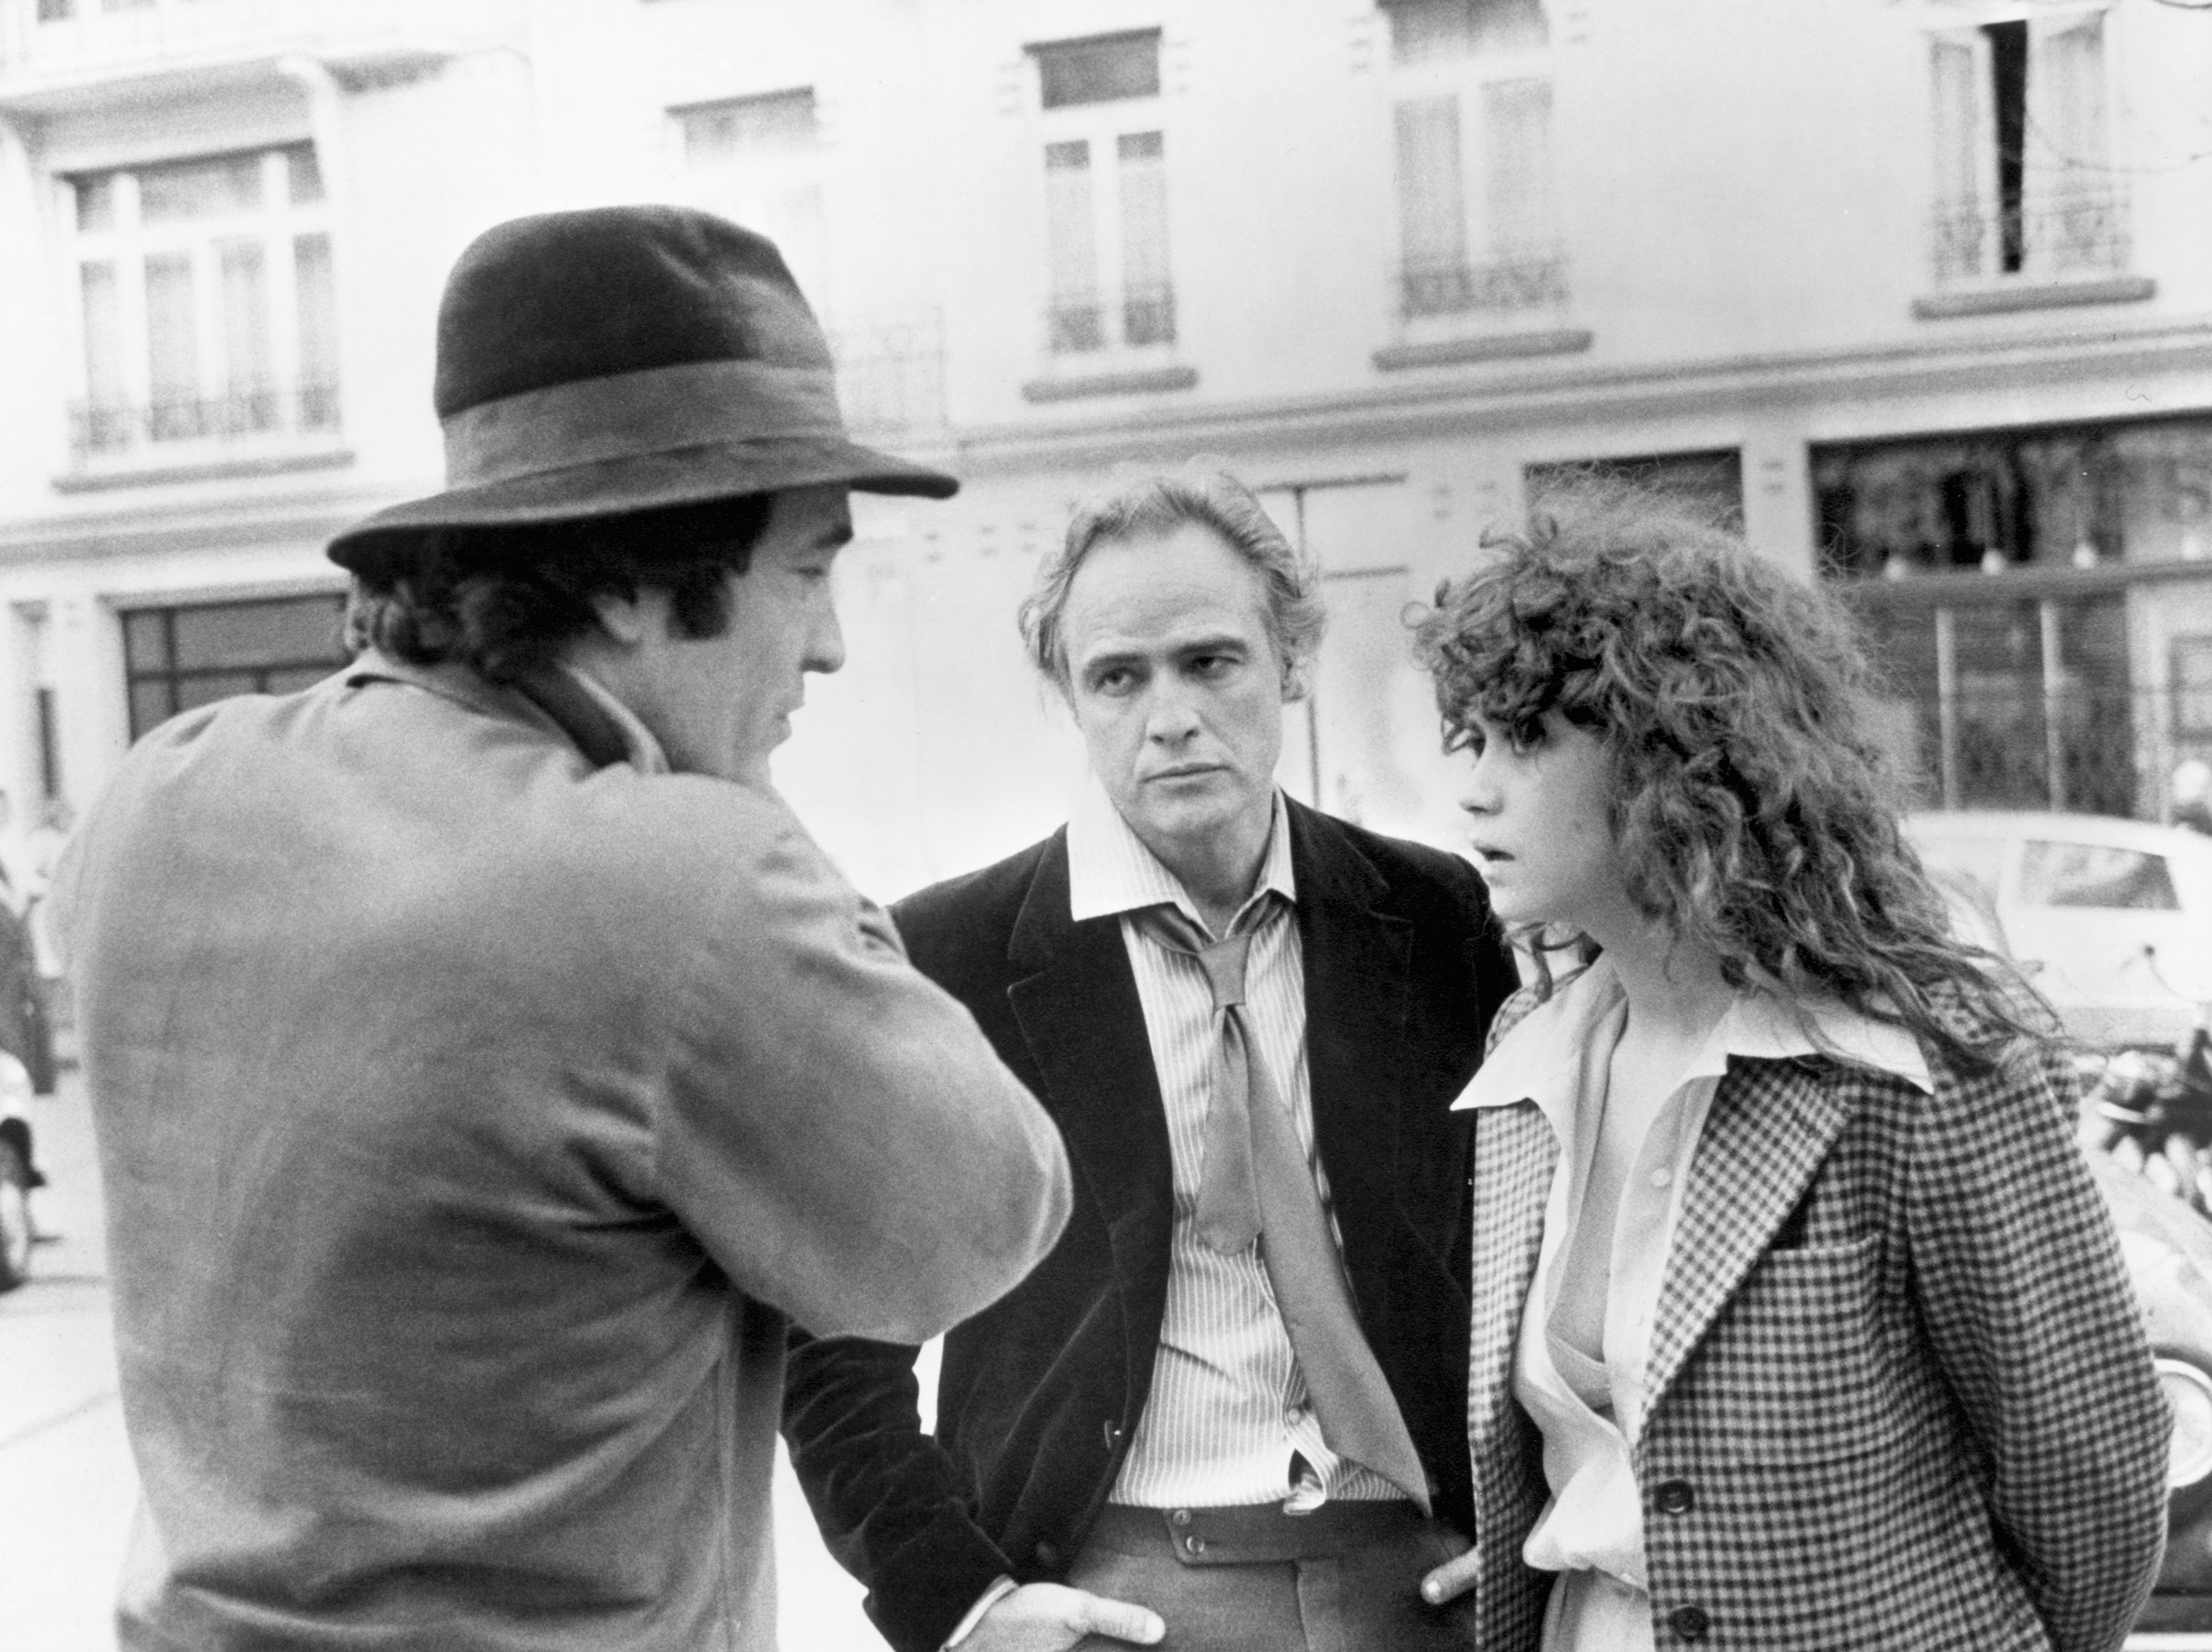 The disturbing story behind the rape scene in Bernardo Bertolucci's Last Tango in Paris, explained